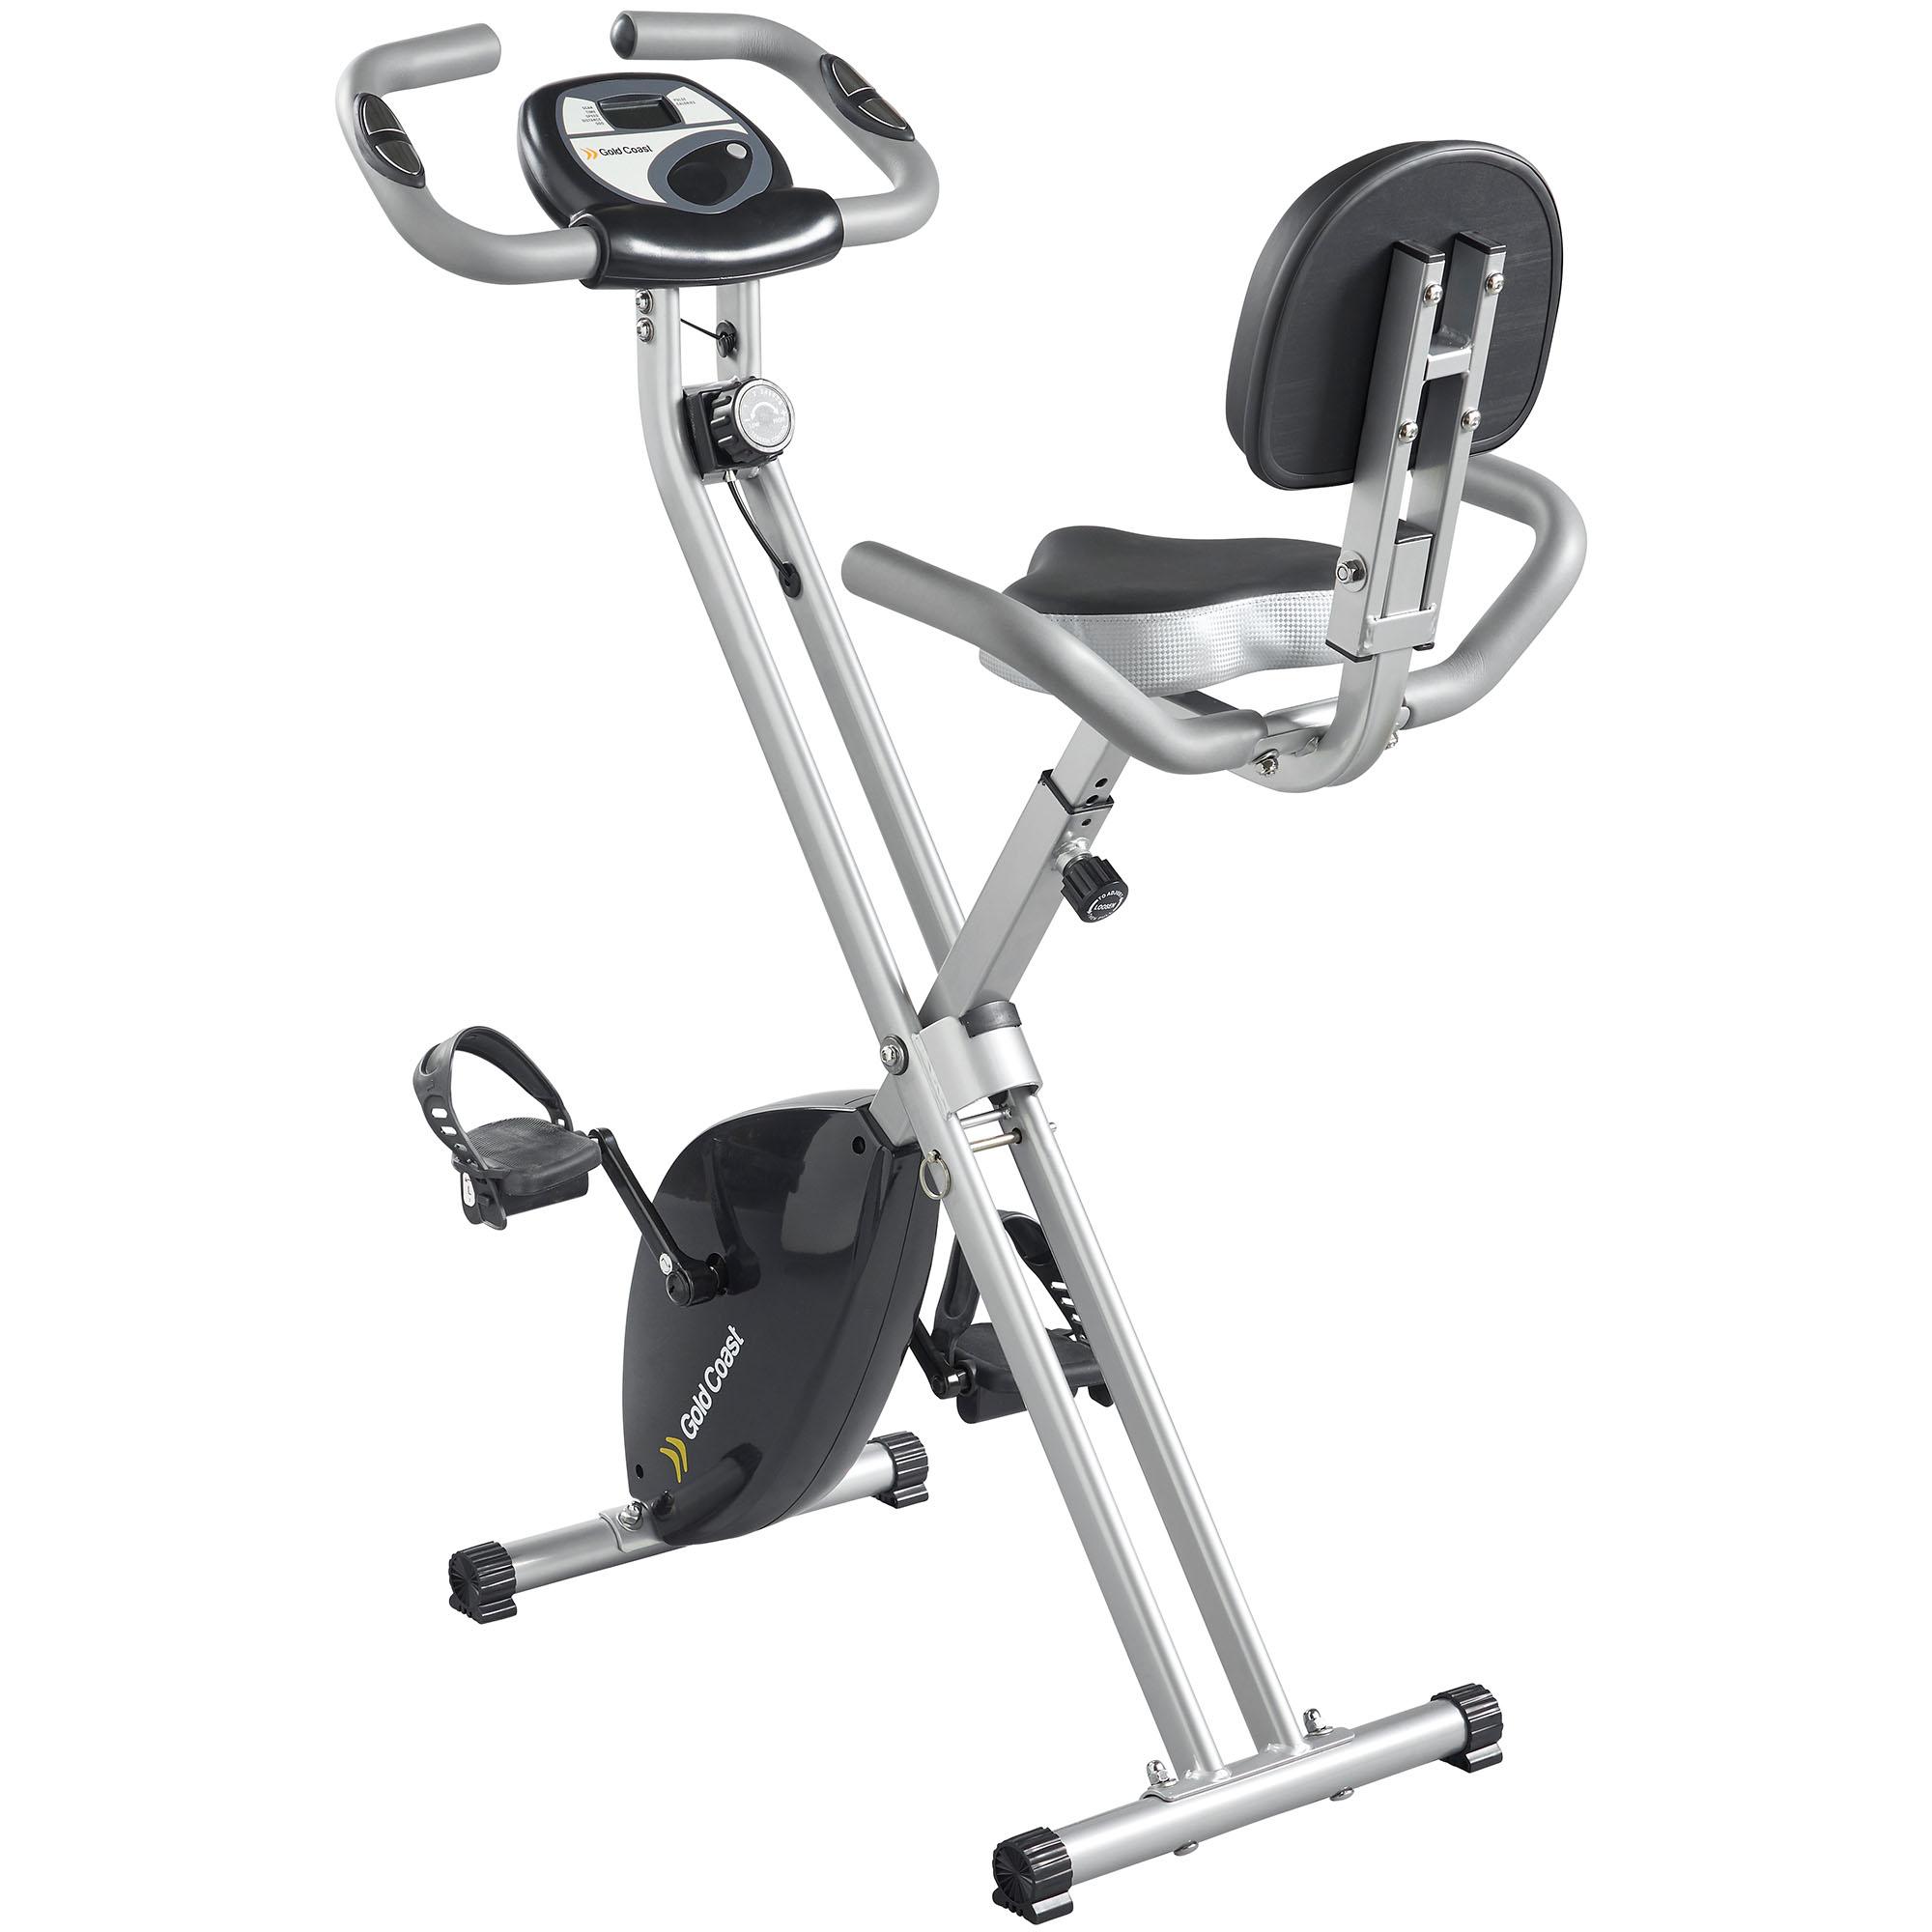 Gym Equipment Gold Coast: Gold Coast Foldable Exercise Bike With Pulse Reader